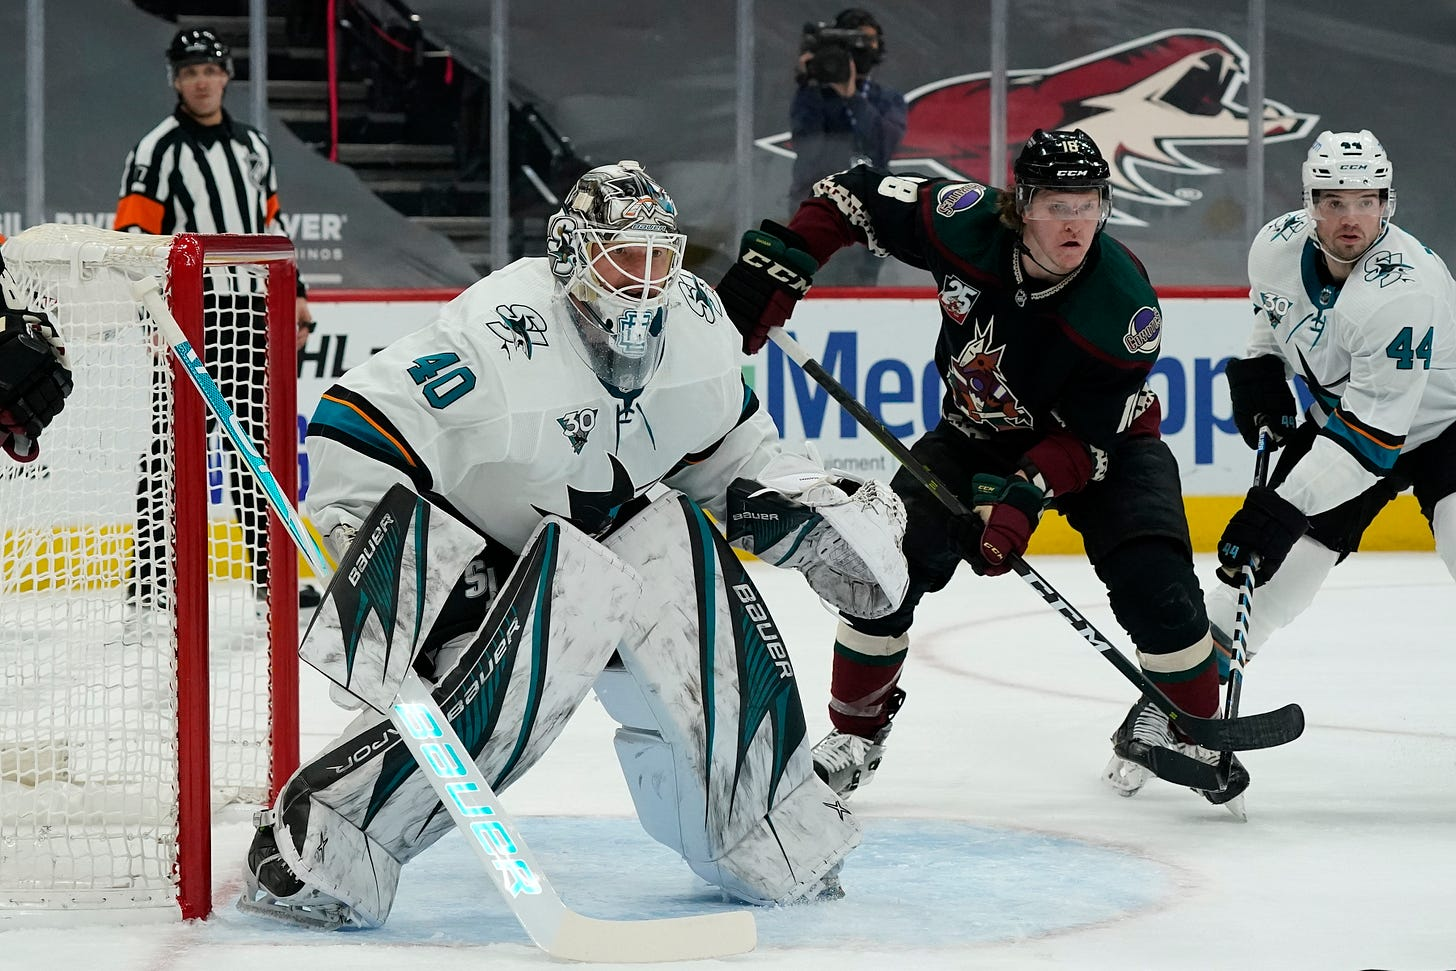 San Jose Sharks' Devan Dubnyk hopes to reboot NHL career